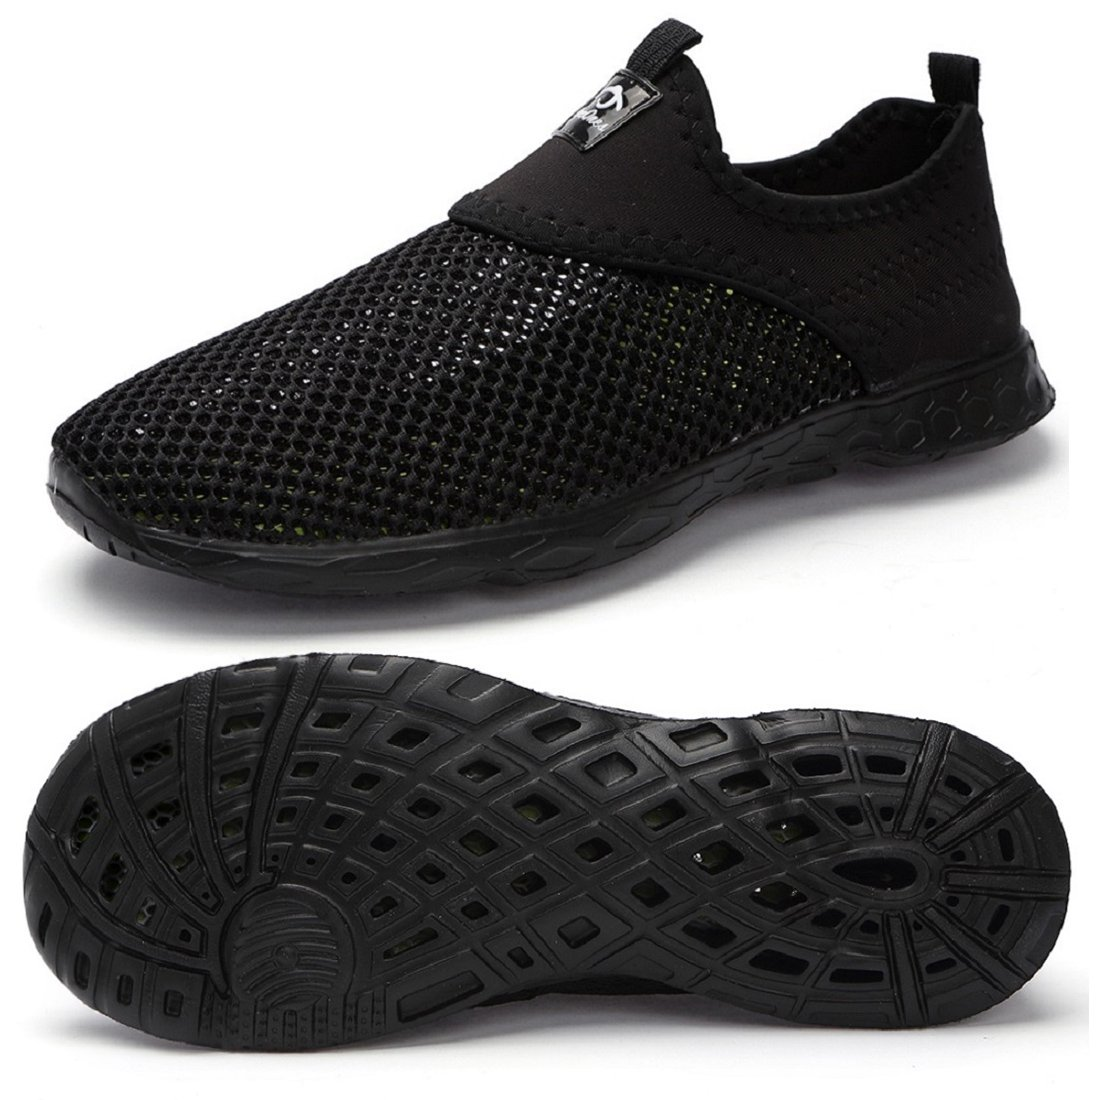 eyeones Men's Women's Lightweight Quick Drying Mesh Aqua Slip-on Water Shoes Perfect Match for Waterproof Phone Case